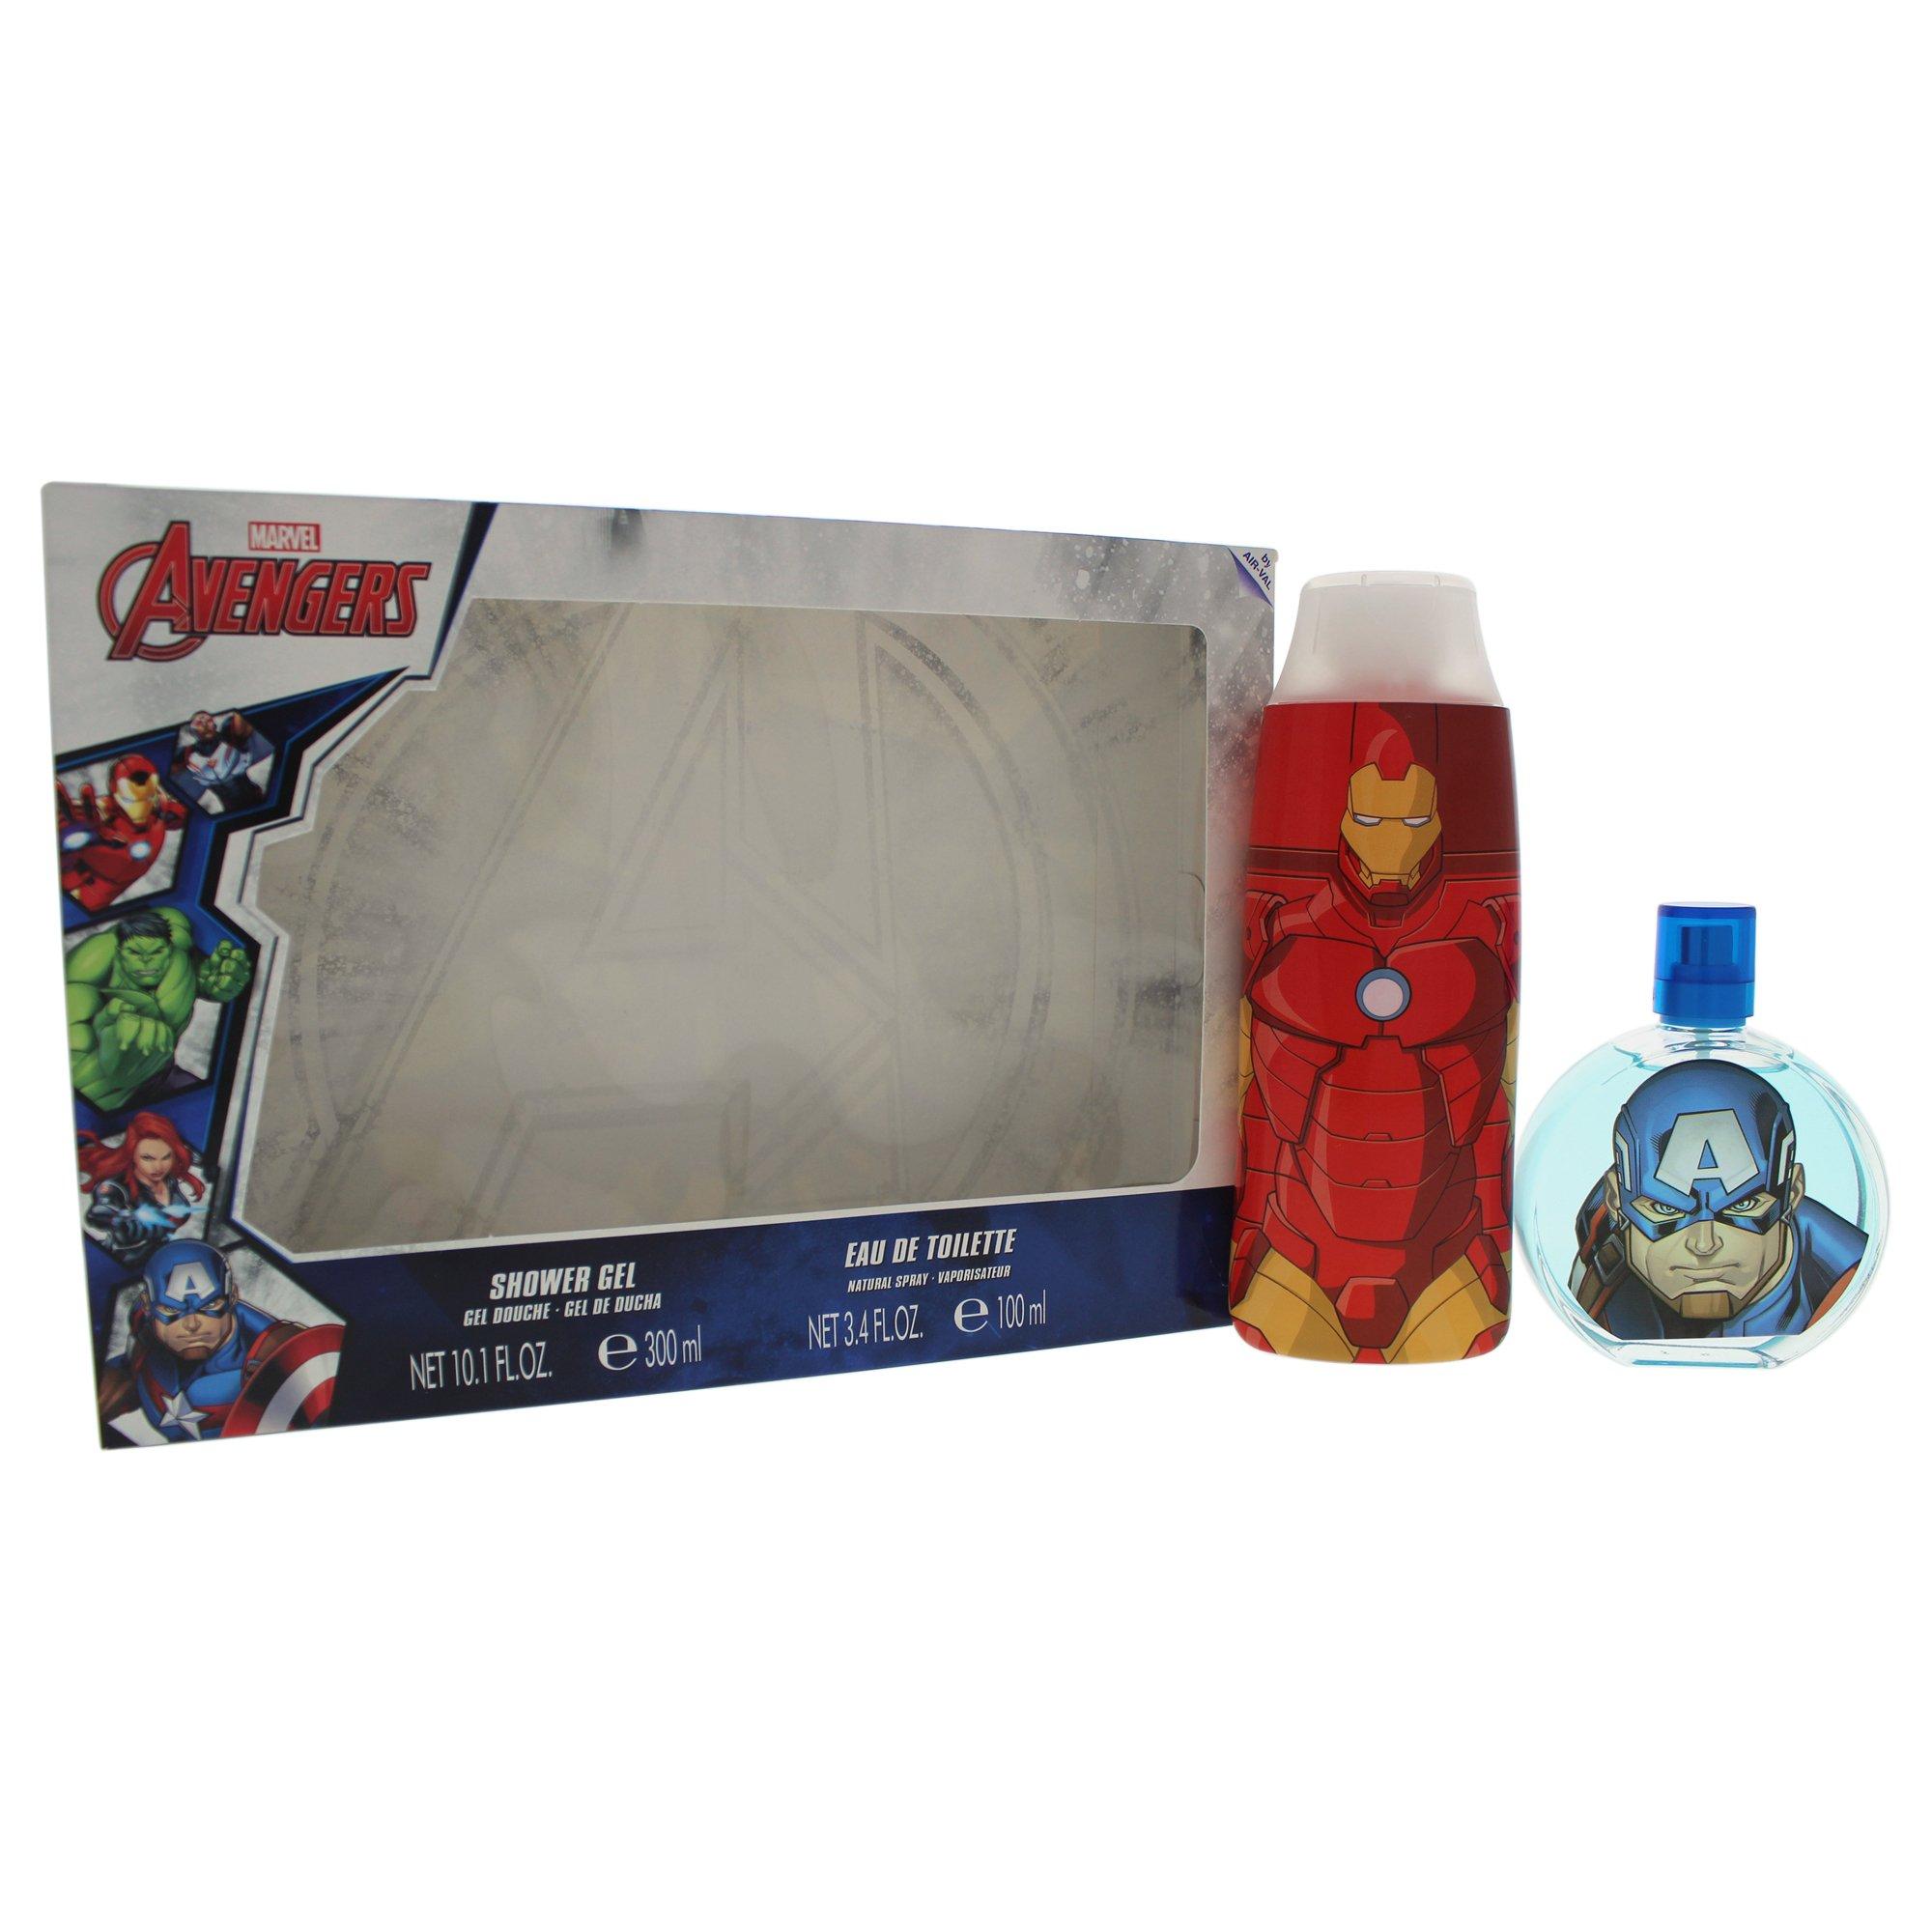 Disney Avengers 2 Piece Eau de Toilette Spray Gift Set for Kids